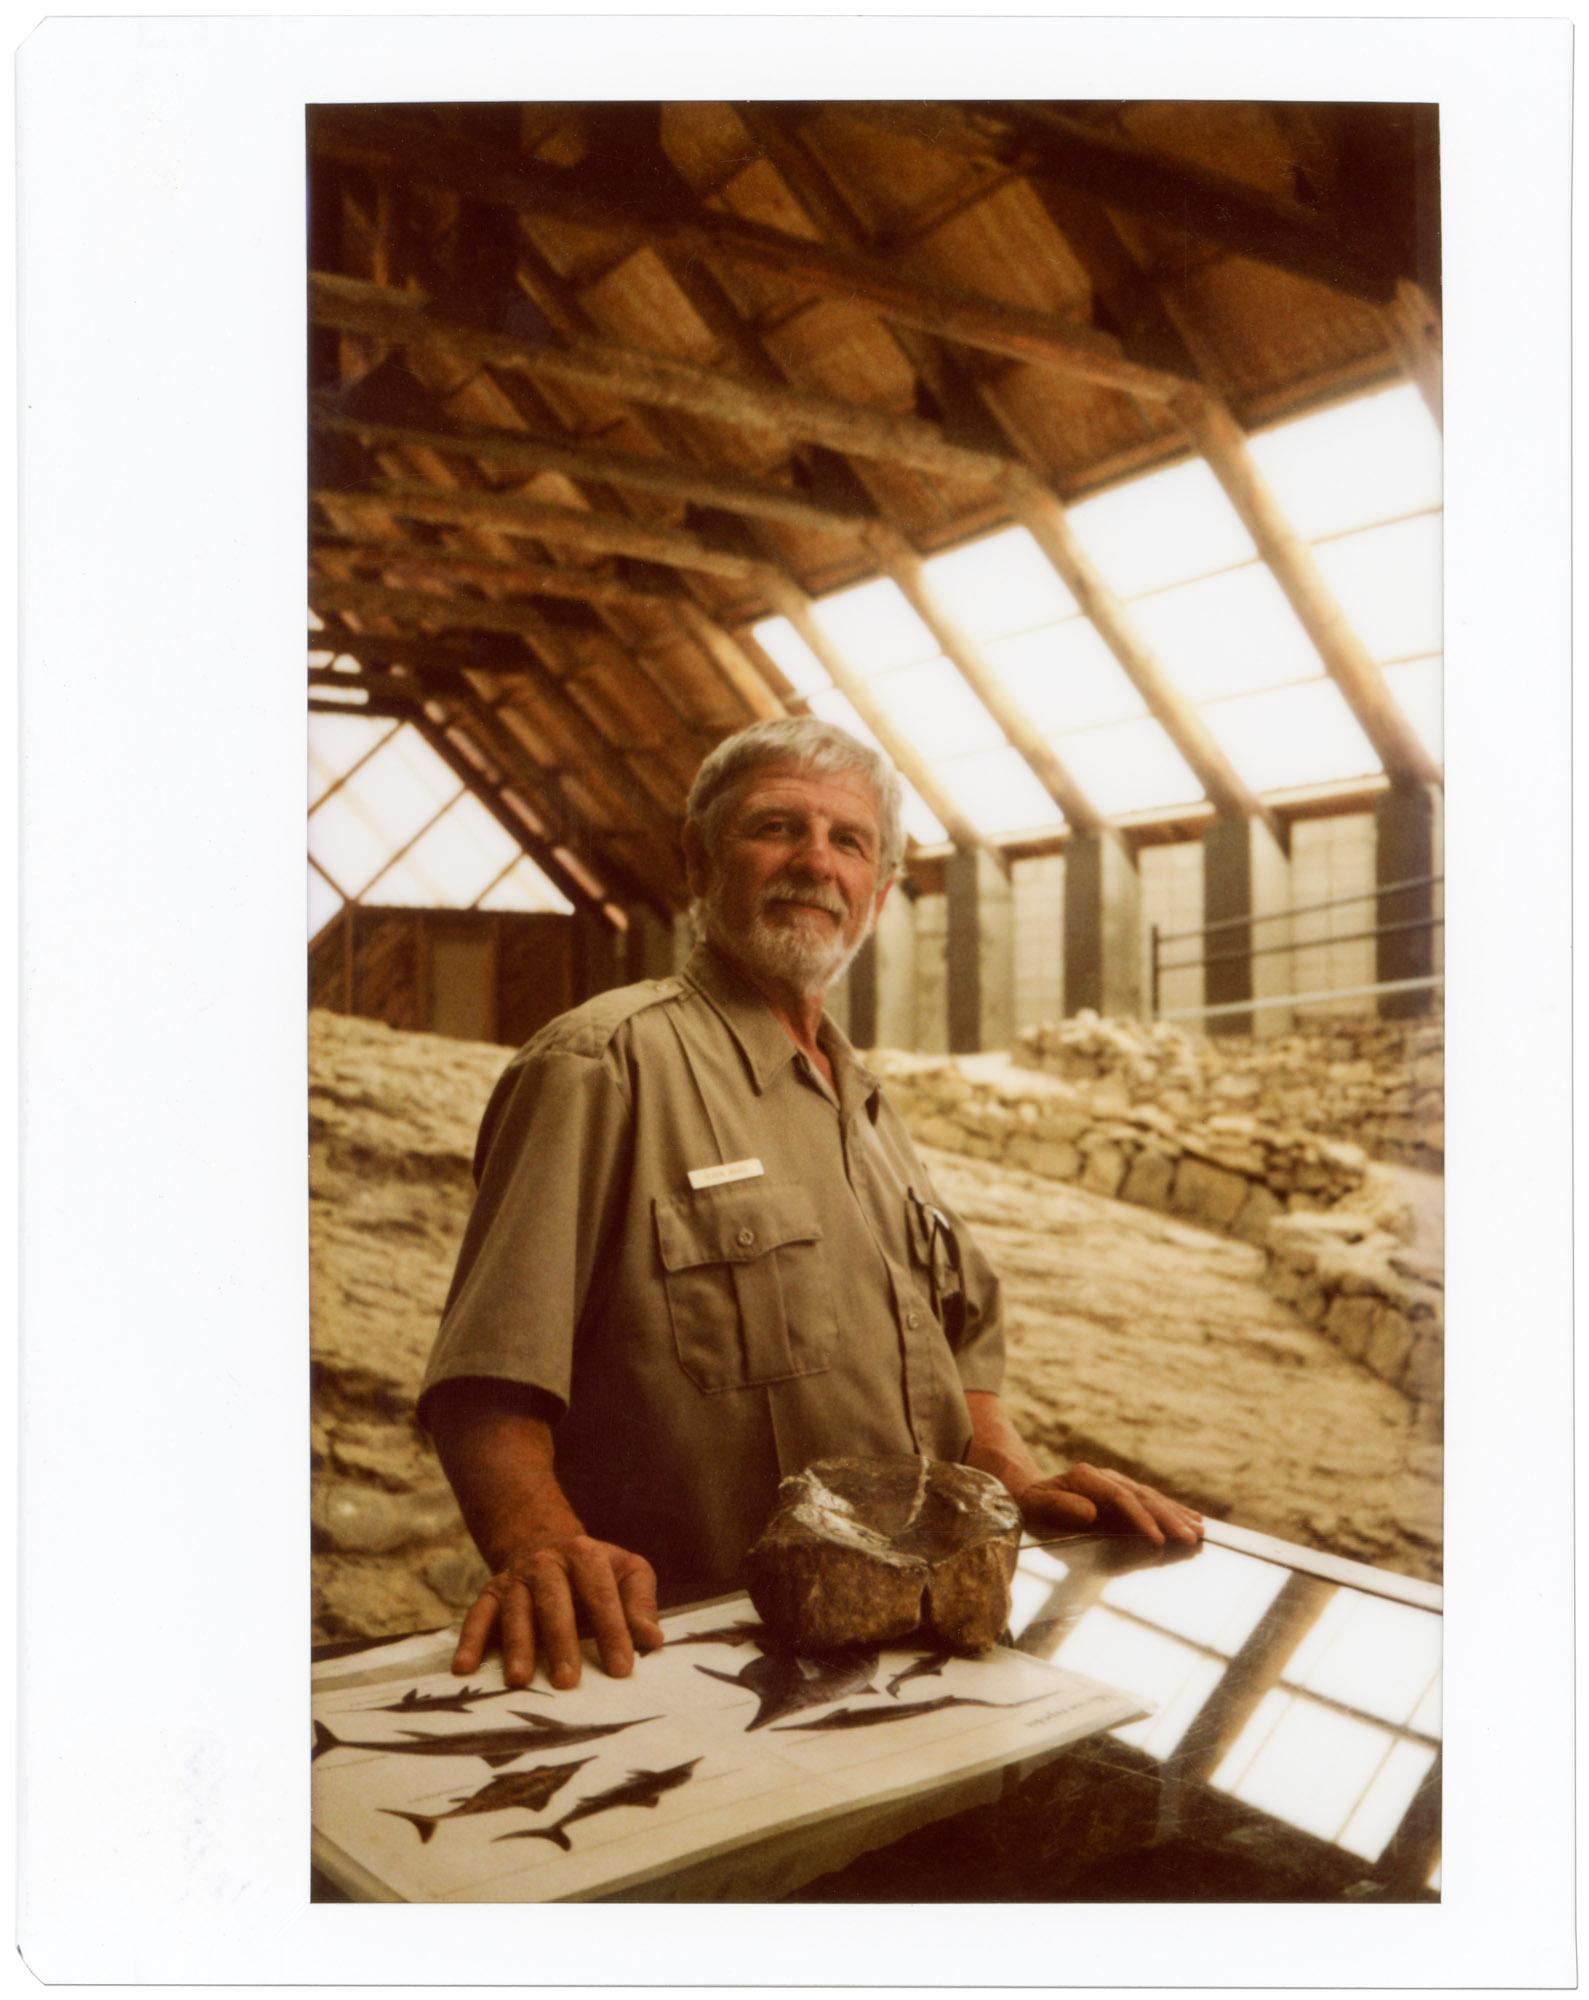 Ranger Robin Riggs // Berlin-Ichthyosaur State Park, Nevada